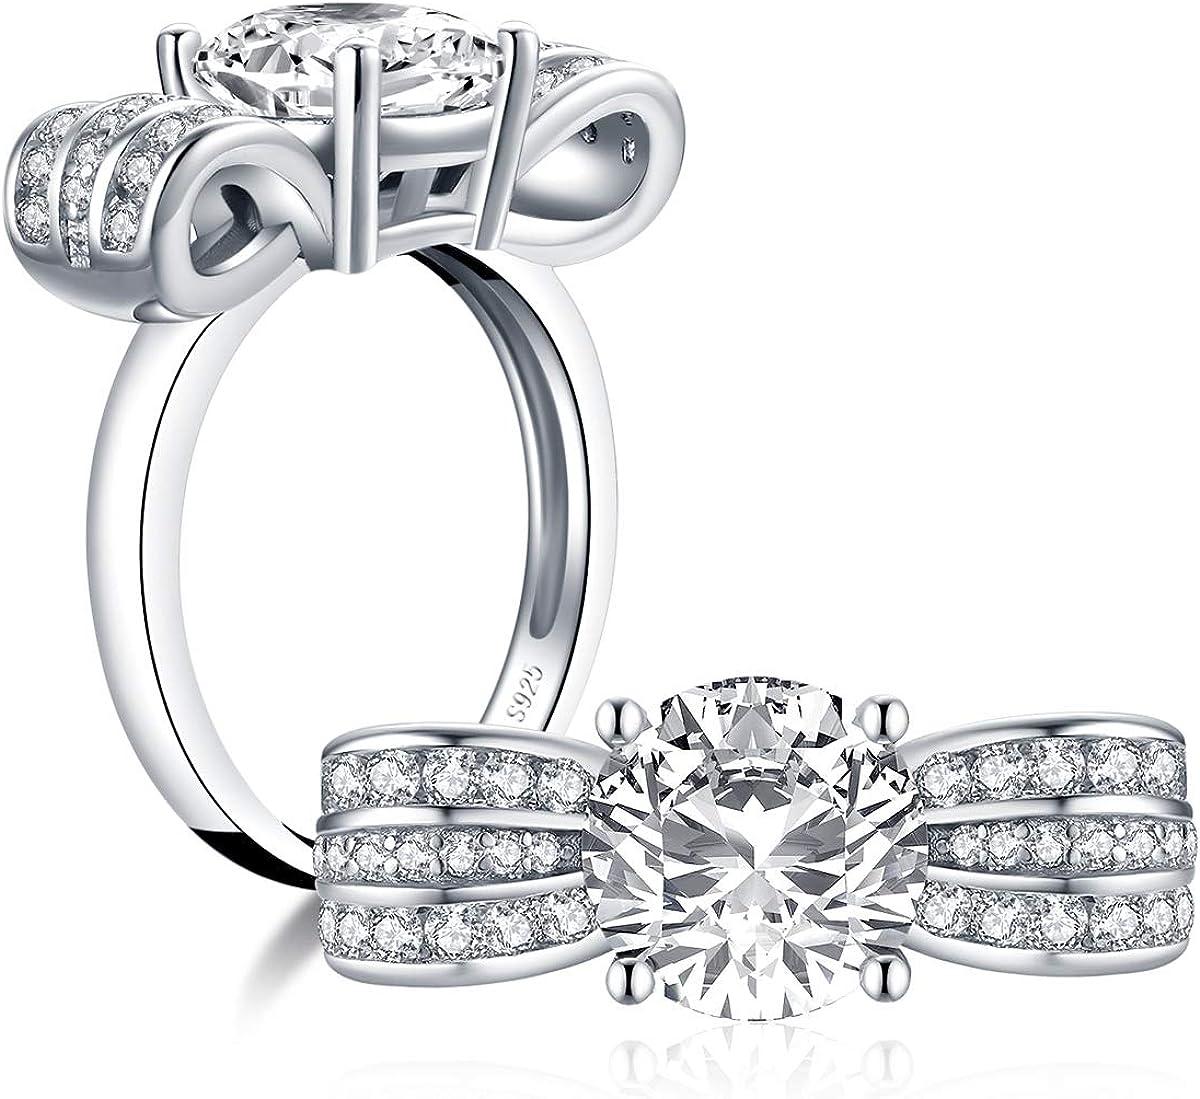 YUNNKAI 驚きの価格が実現 当店は最高な サービスを提供します 925 Sterling Silver Platinum Zirconia Cubic Plated Round